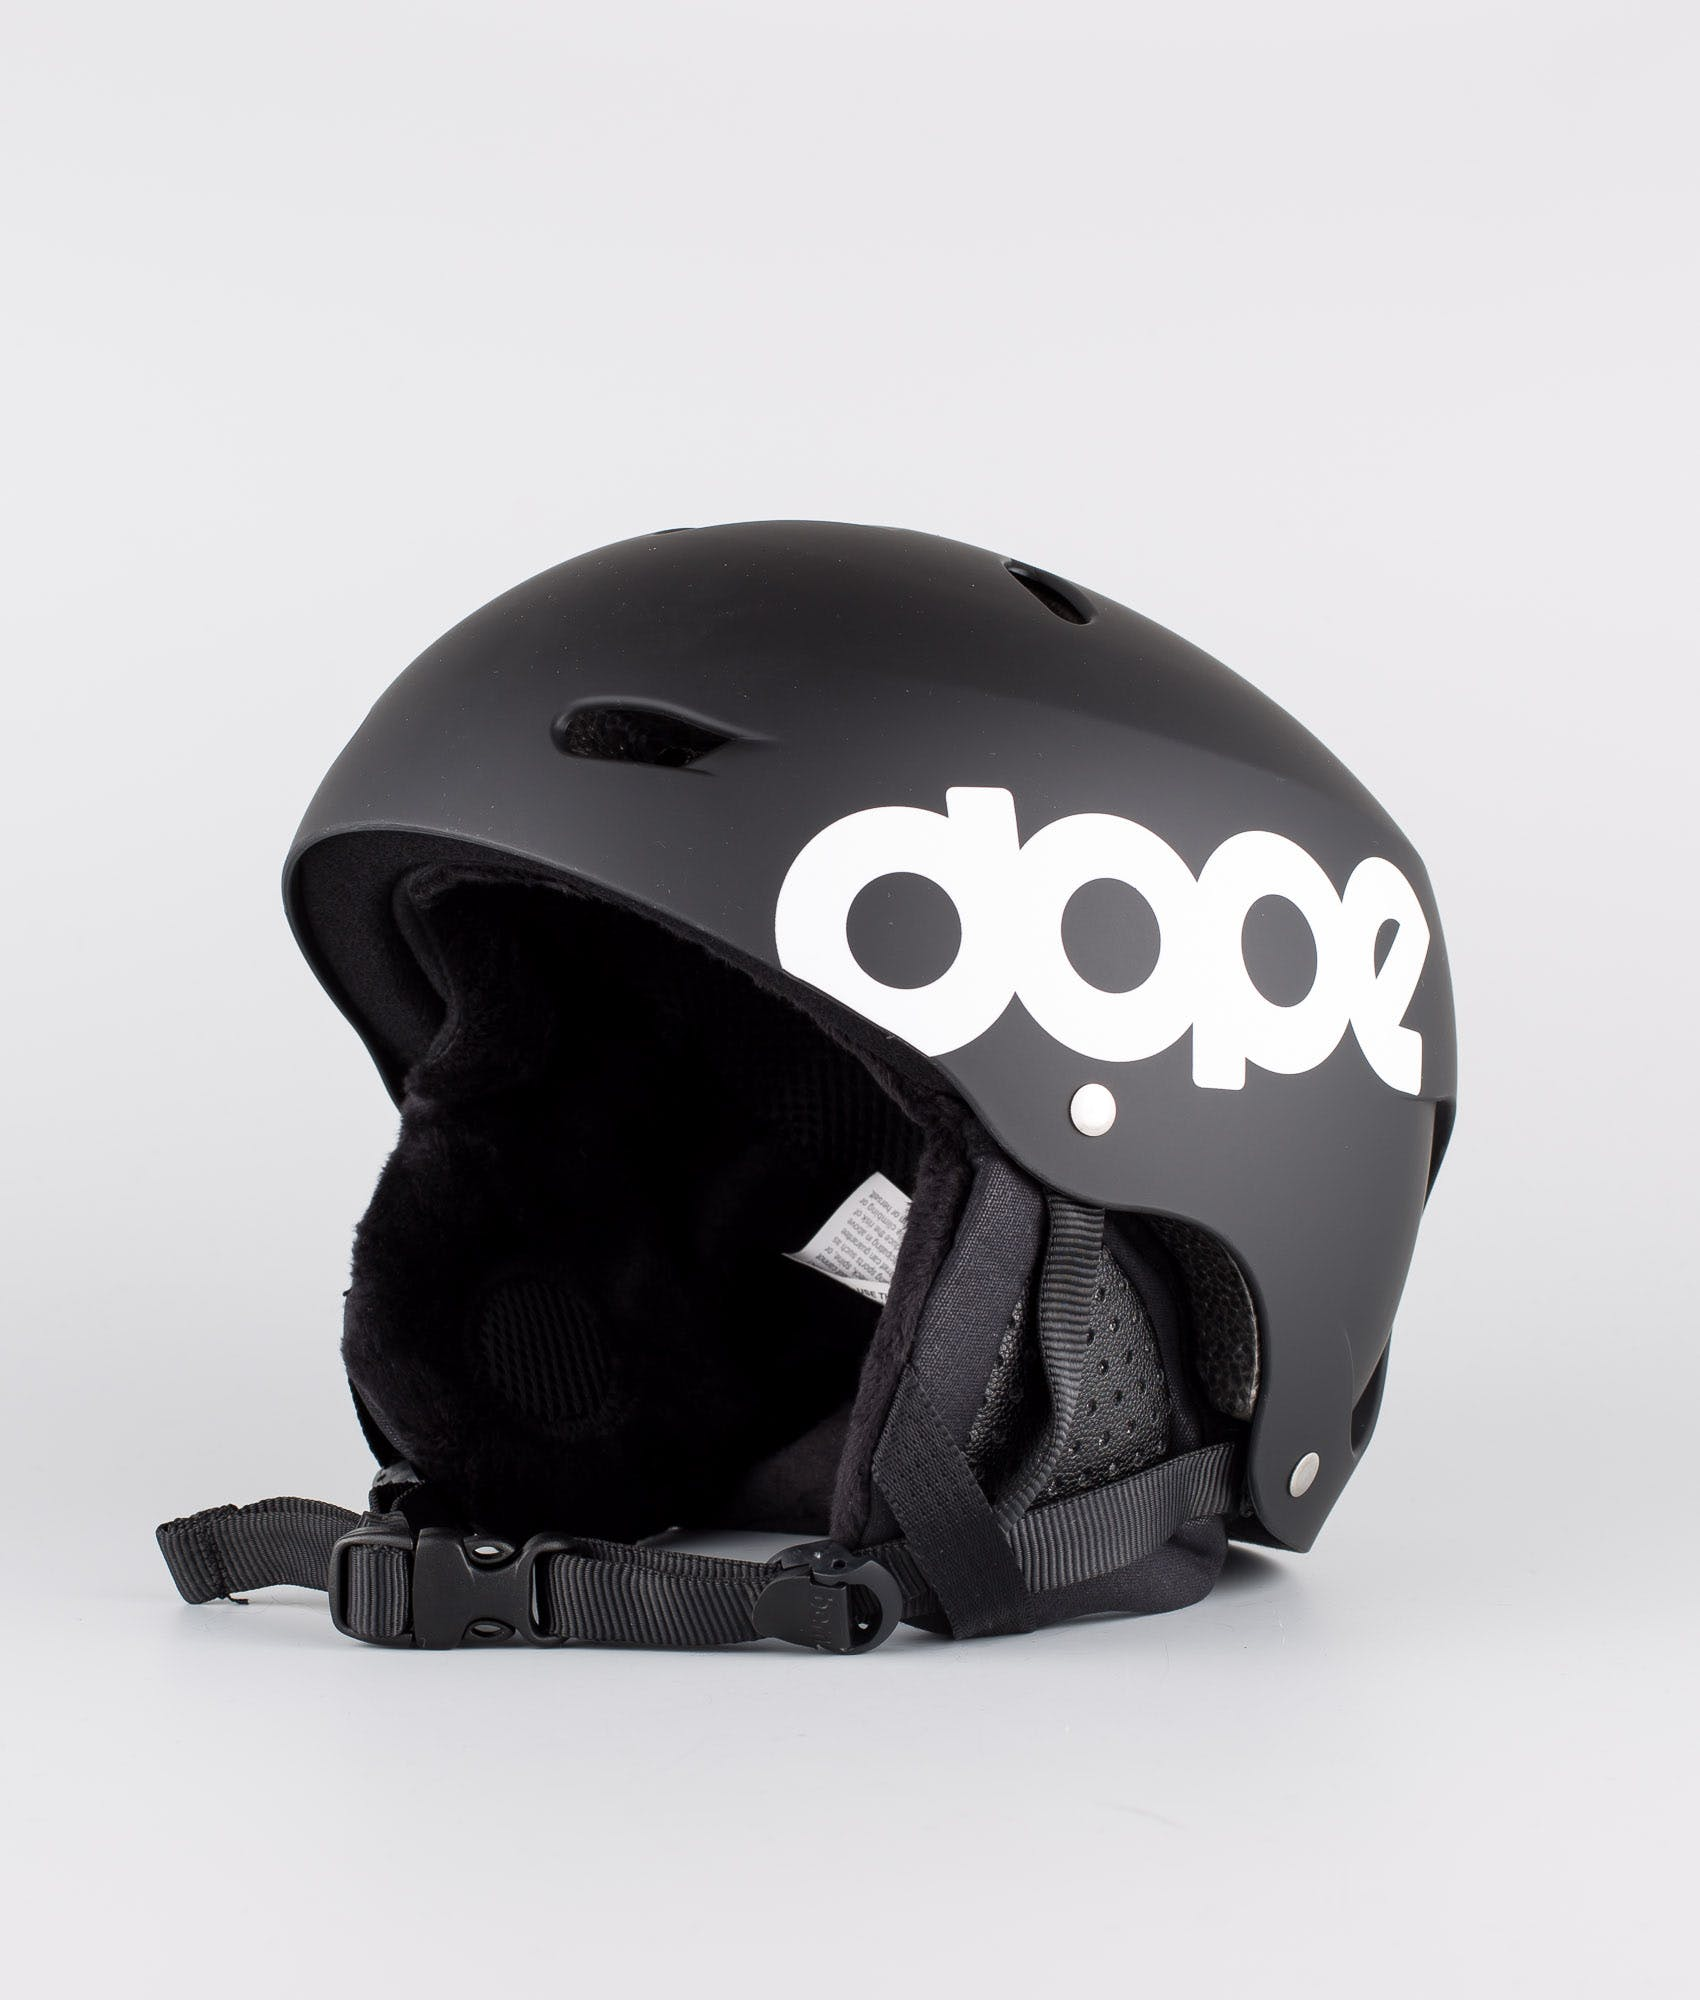 dope ski helmet